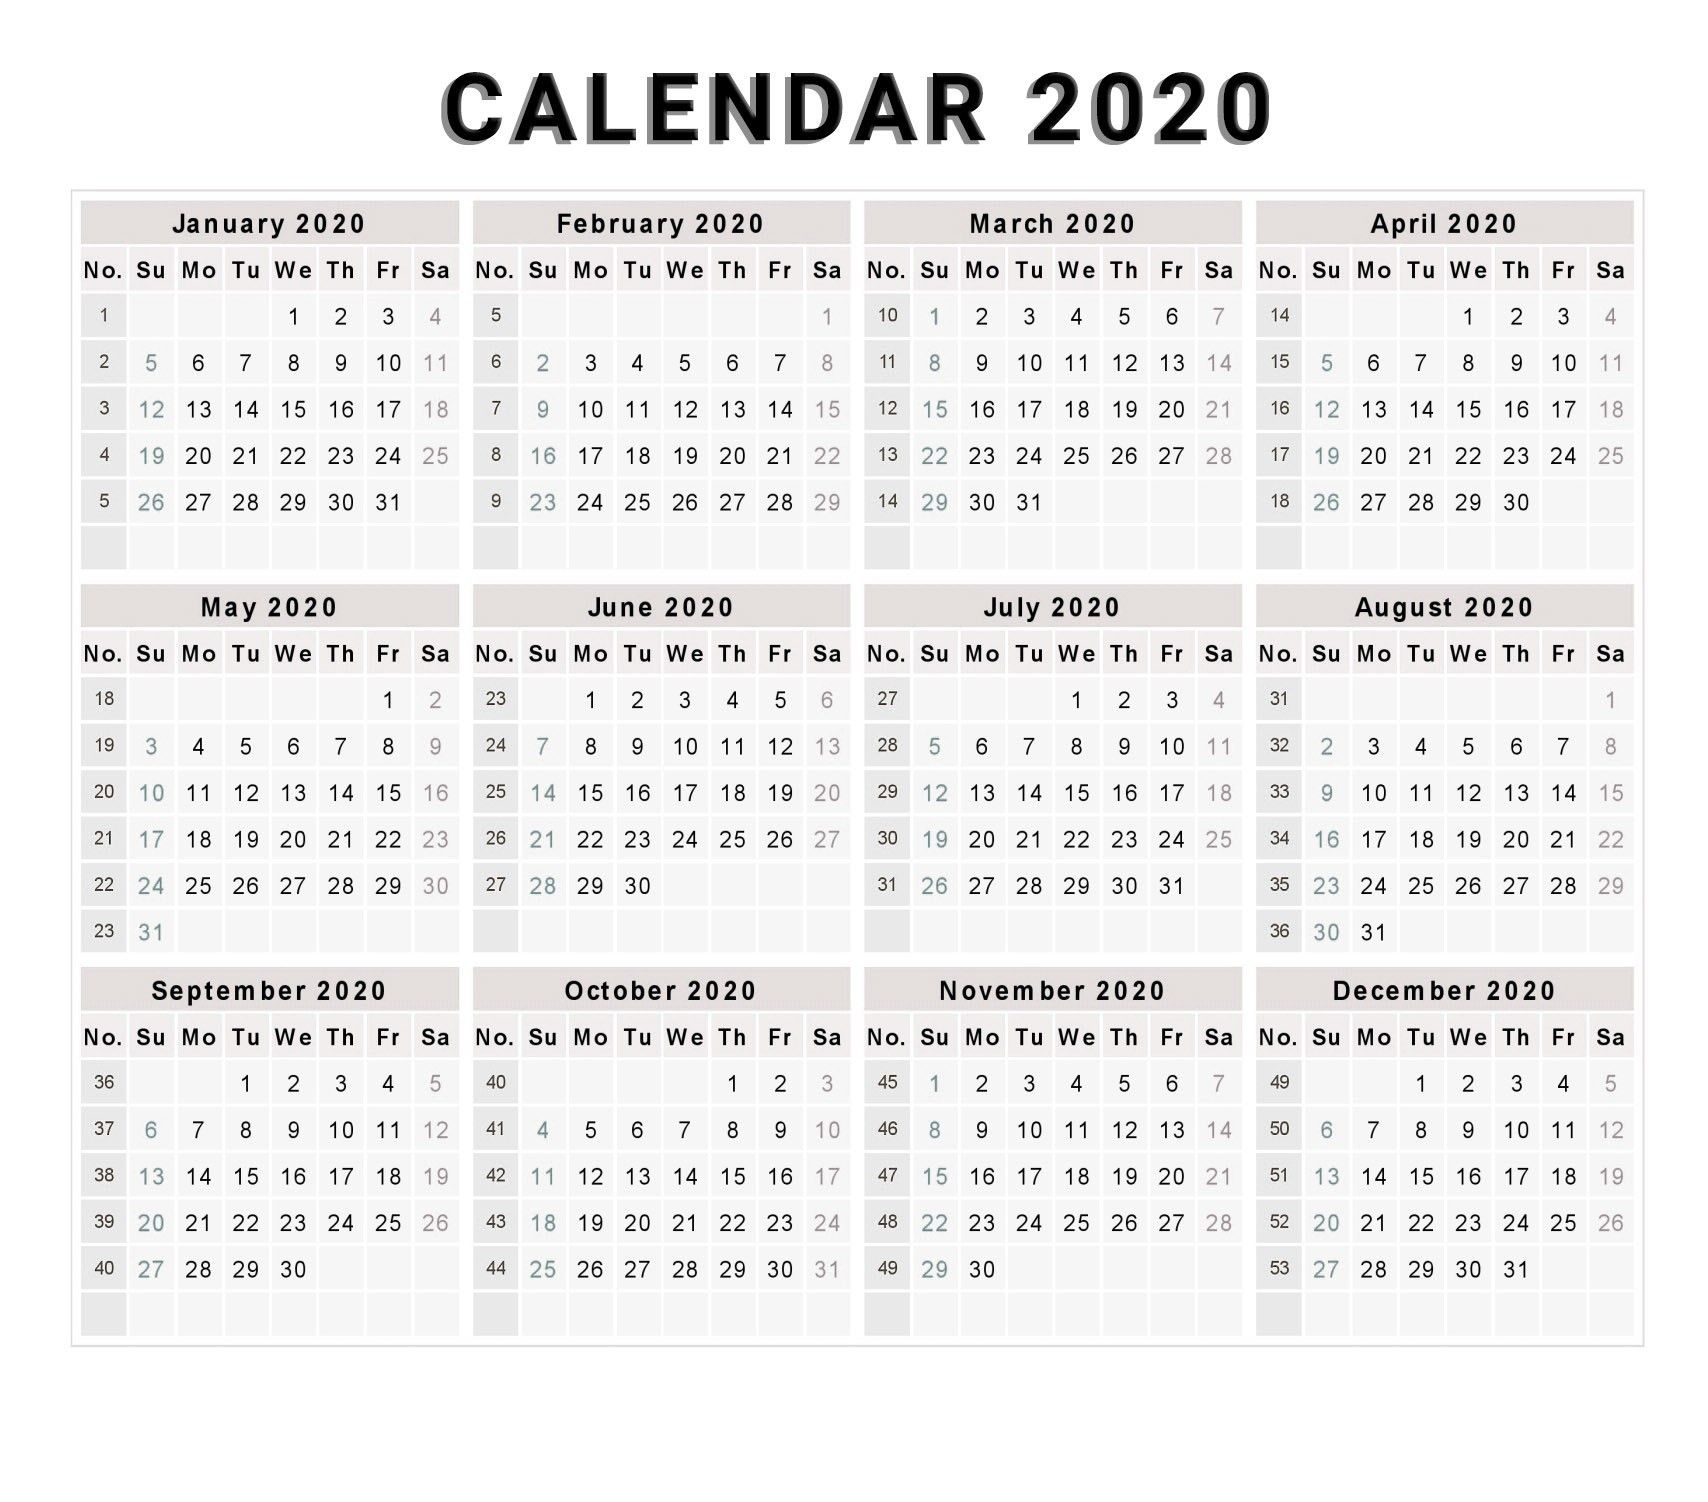 Calendar 2020 Free Printable Calendar 2020 Free 2020 regarding Free Printable 2020 Calendars Large Numbers